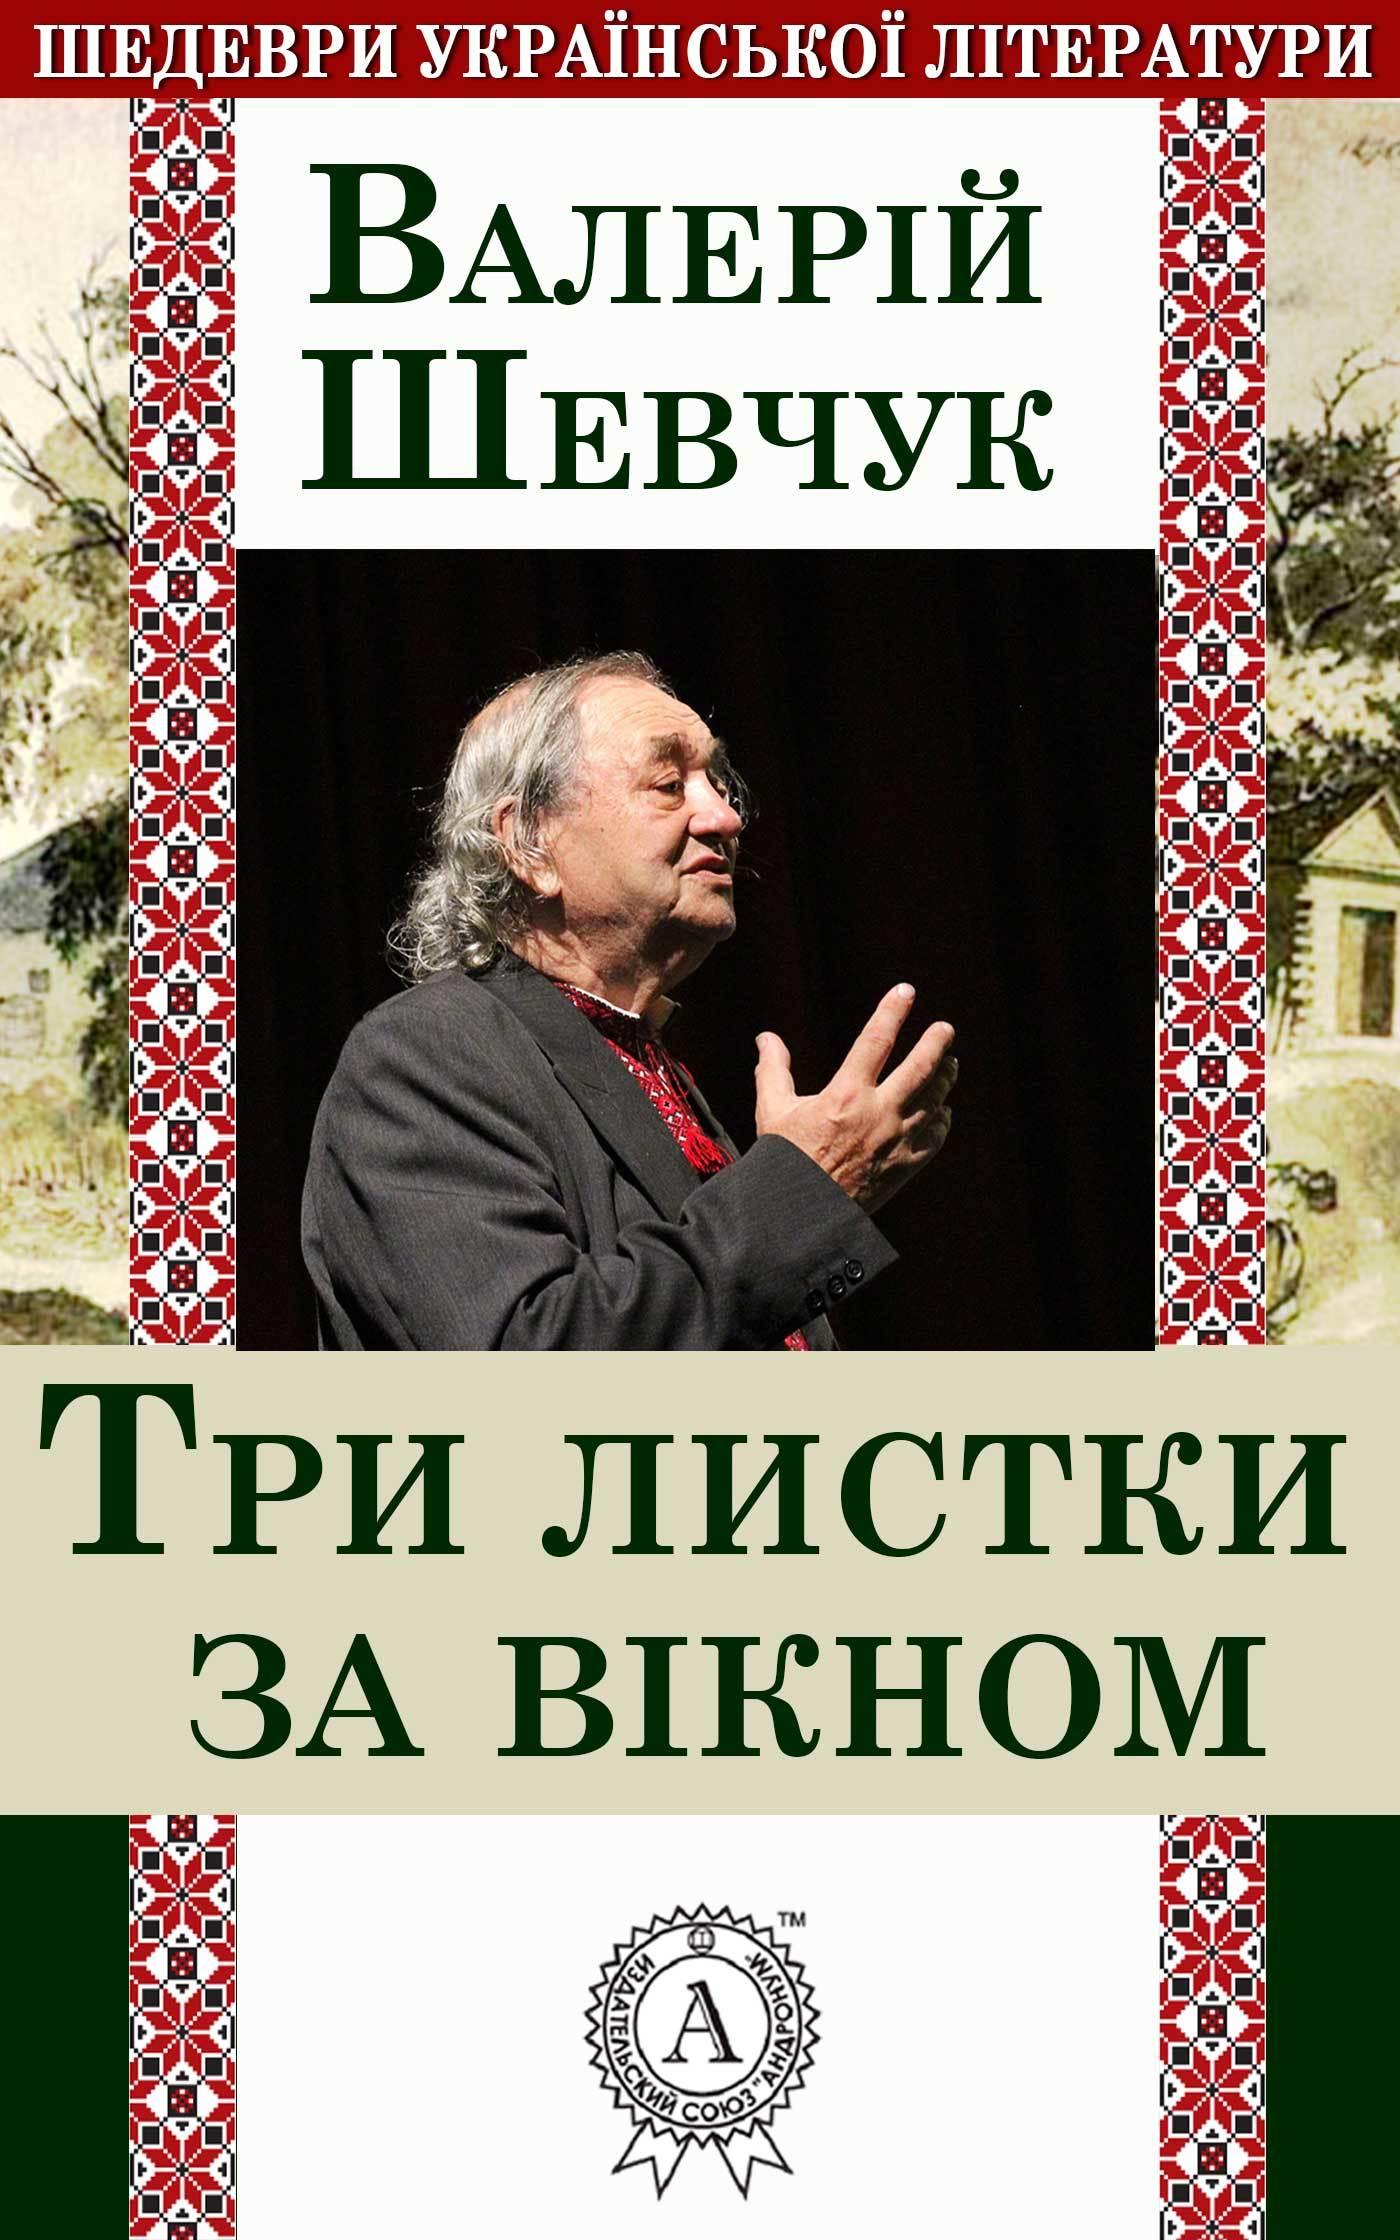 обложка книги static/bookimages/21/54/68/21546836.bin.dir/21546836.cover.jpg